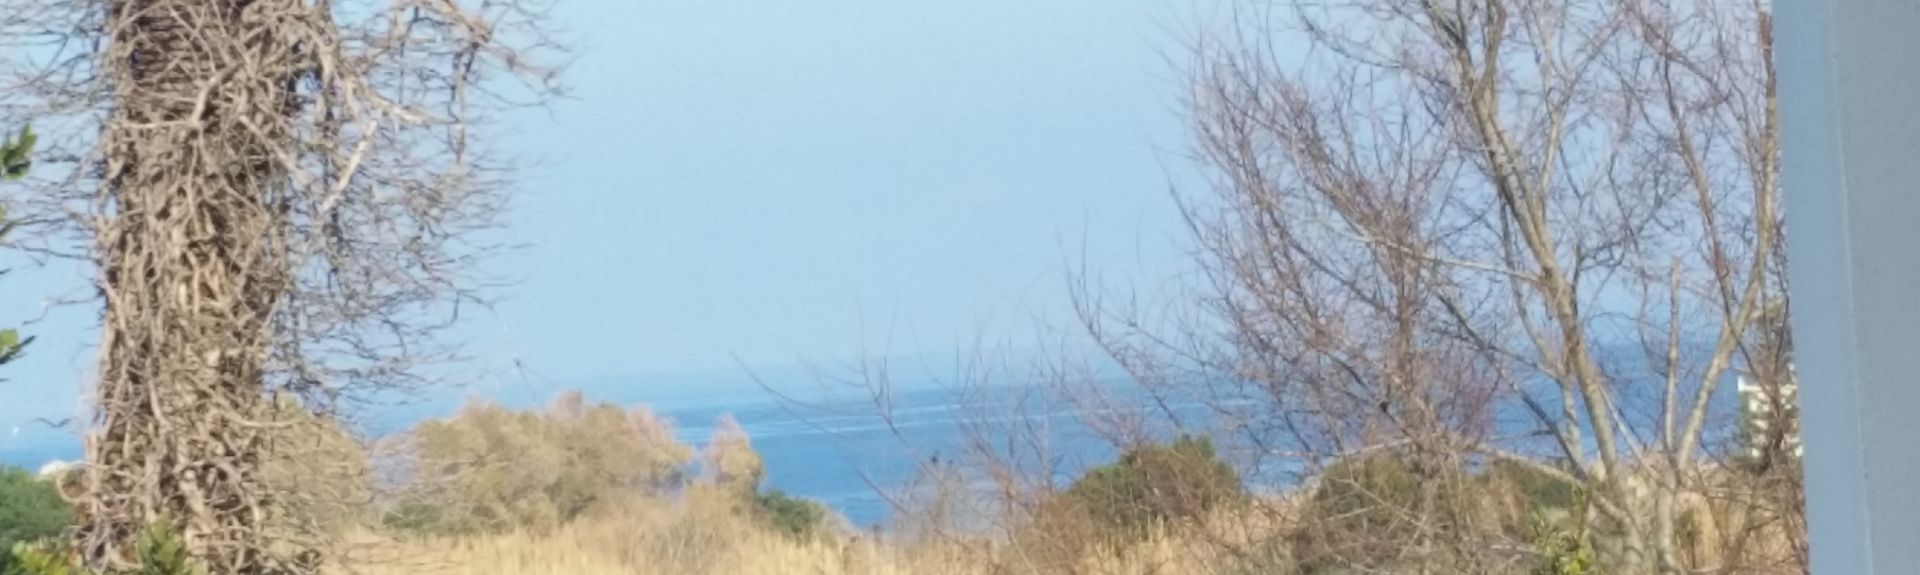 Maglie, Puglia, Italia